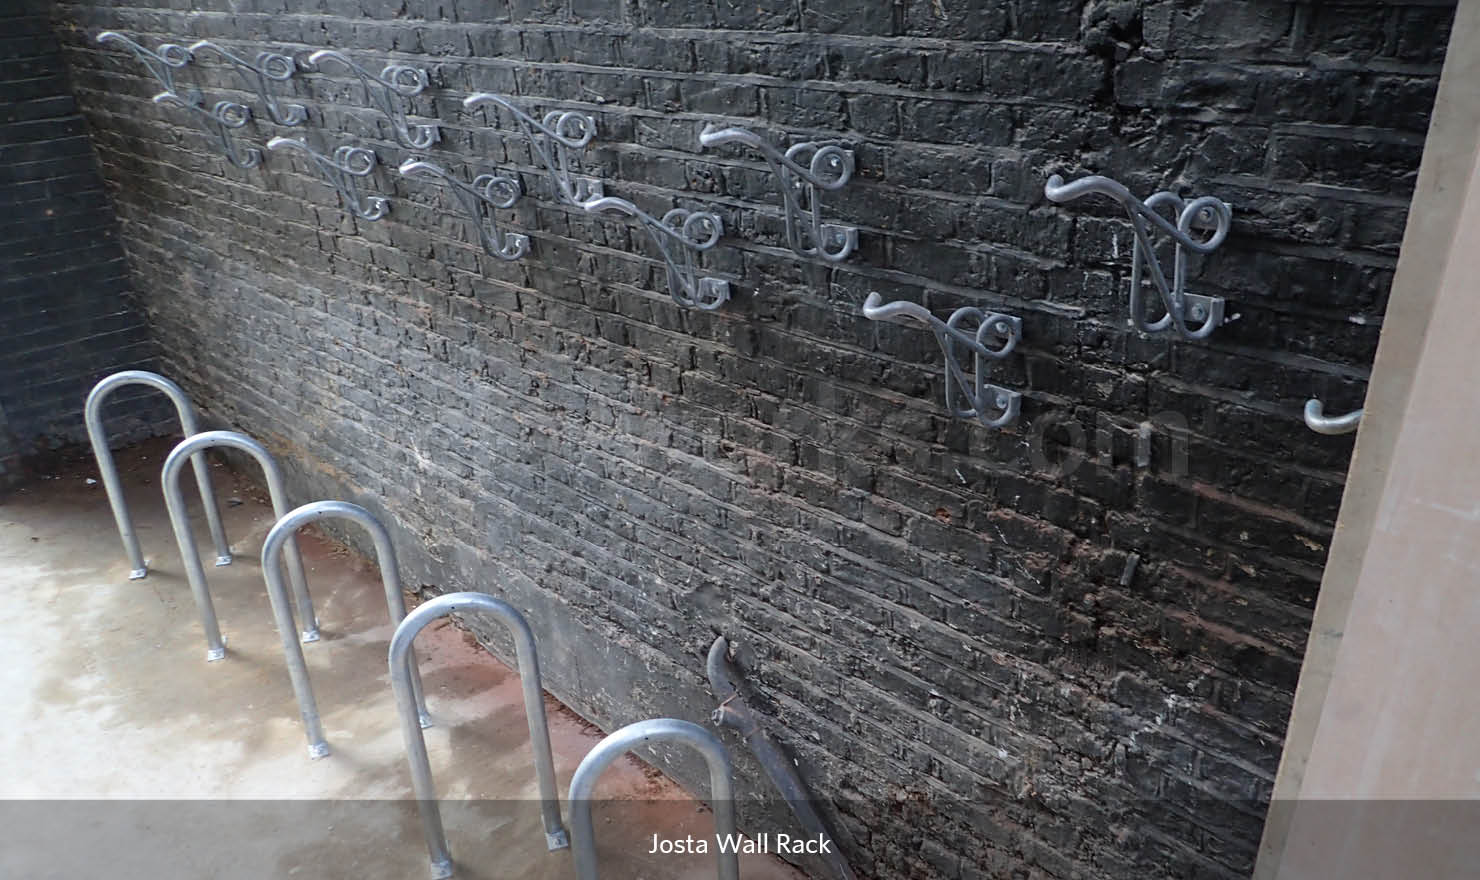 Josta® Wall Rack – Cycle Works